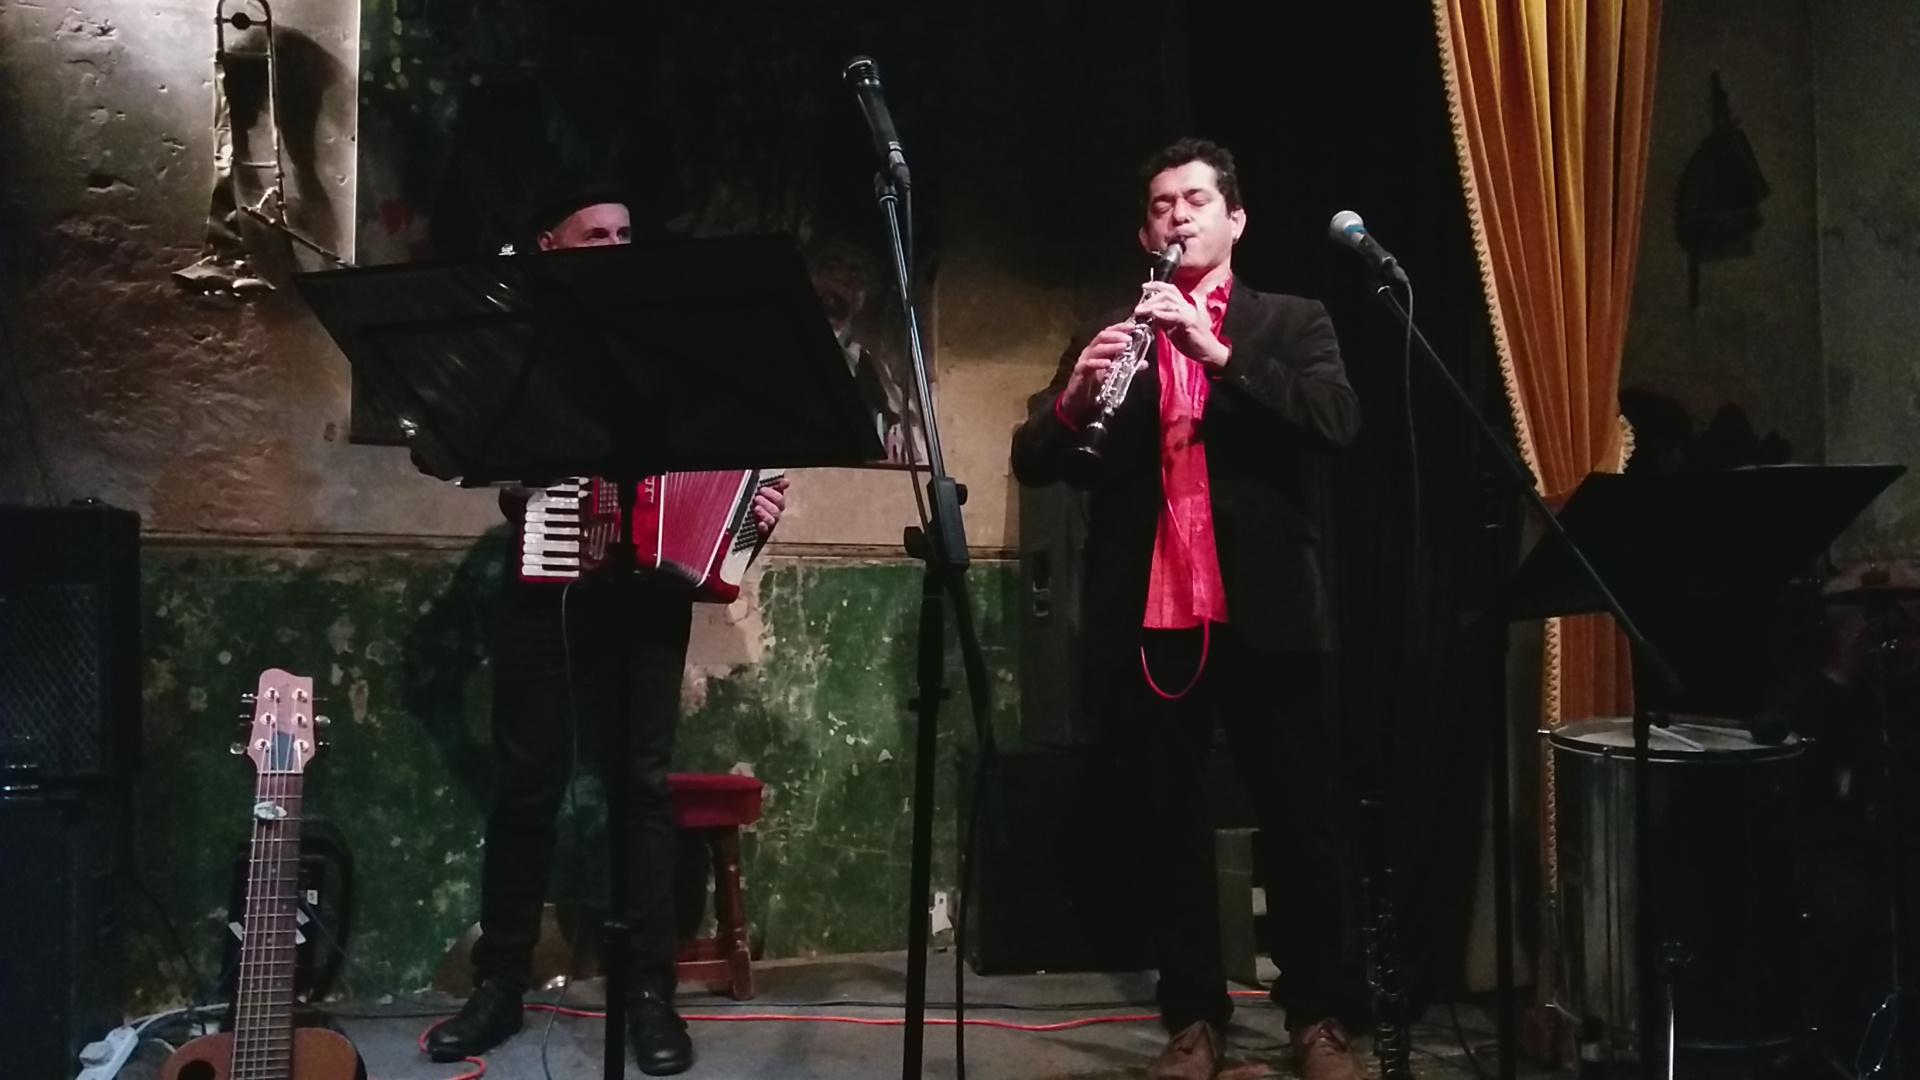 jamboree-merlin-lorin-jpg